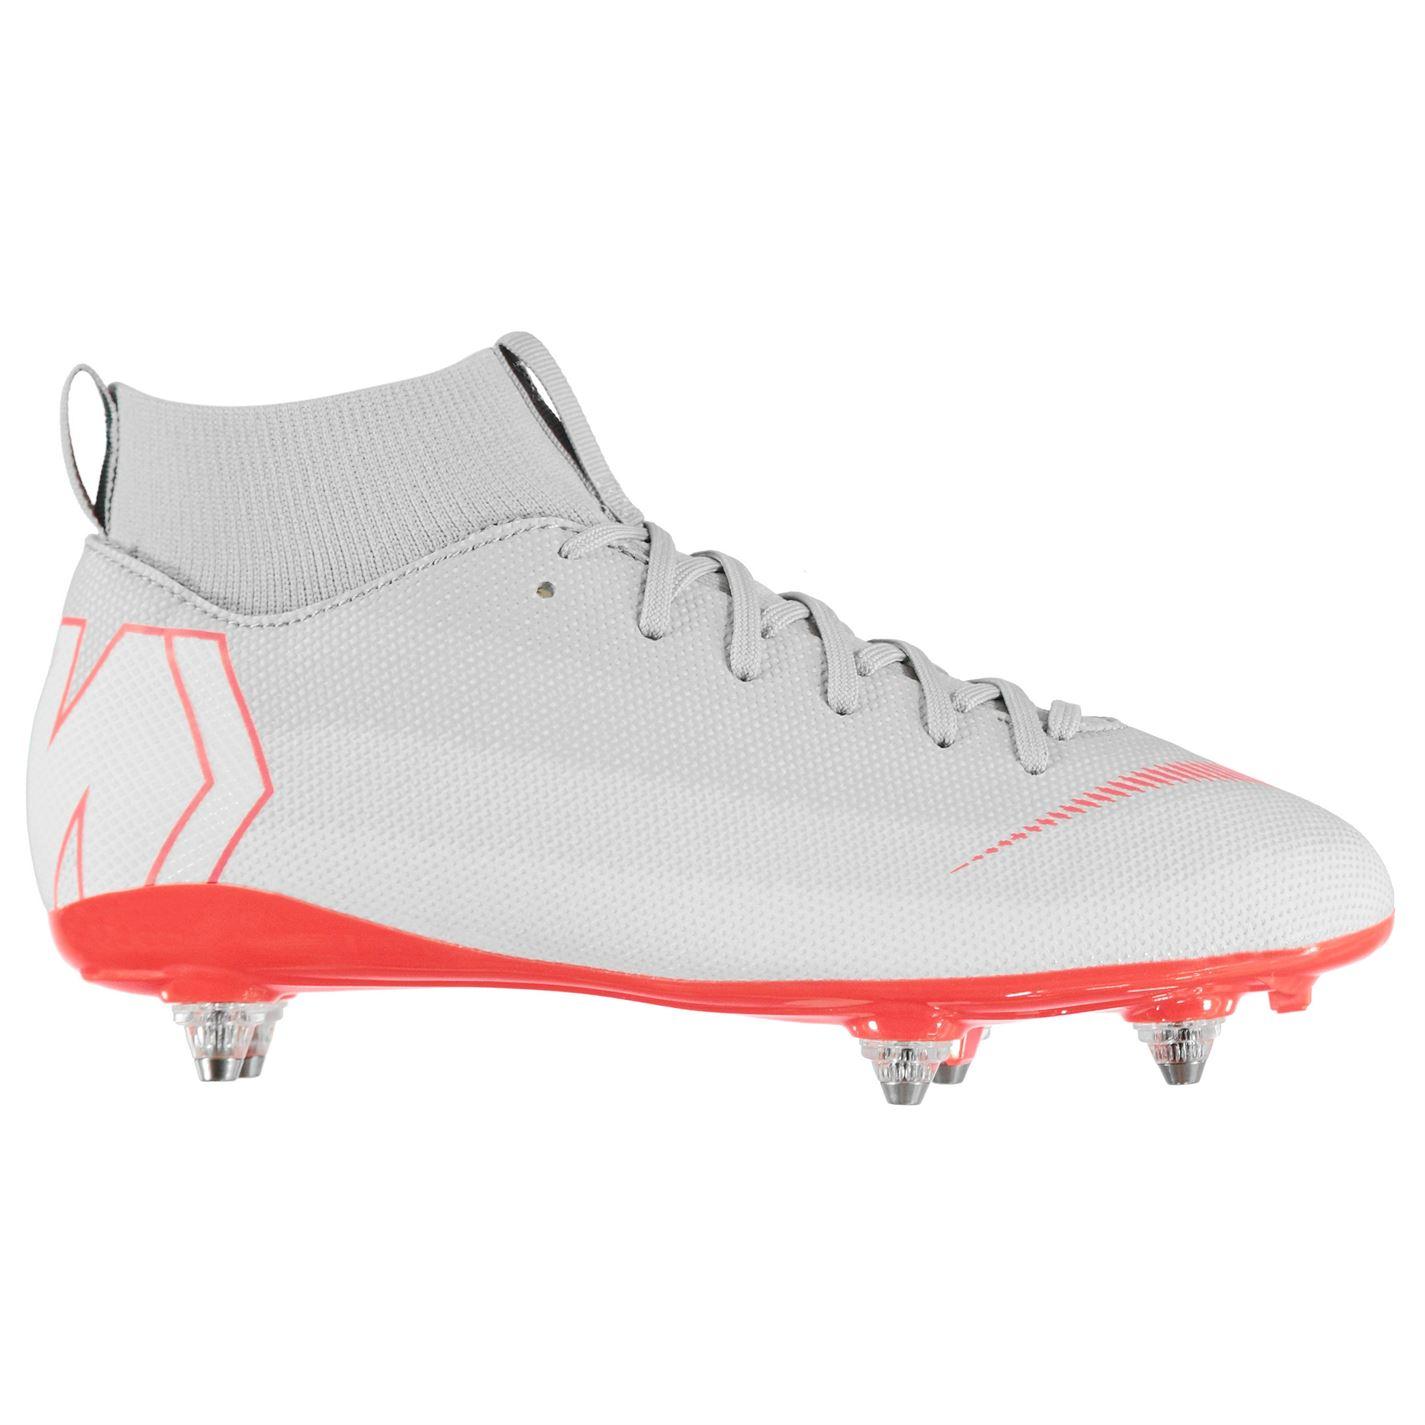 Nike Mercurial Academy DF Junior Boys SG Football Boots